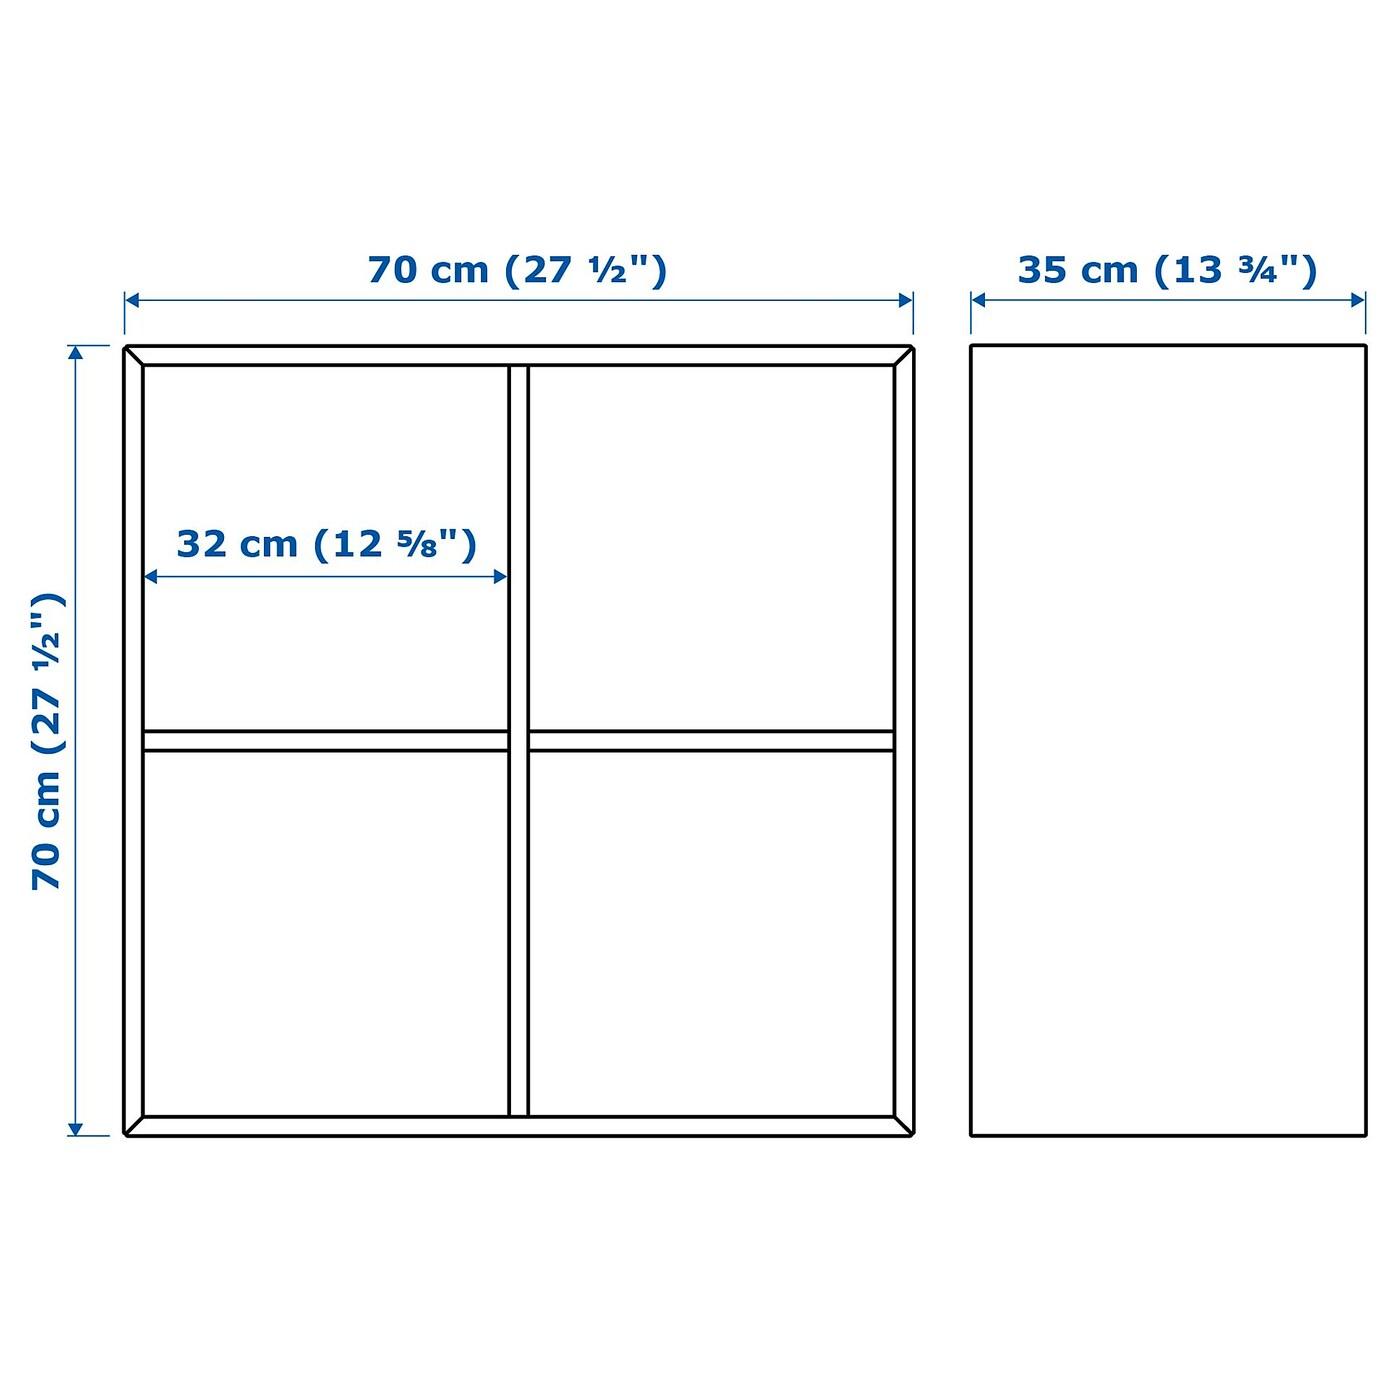 EKET Seinähylly, 4 lokeroa - vaaleanharmaa 70x35x70 cm